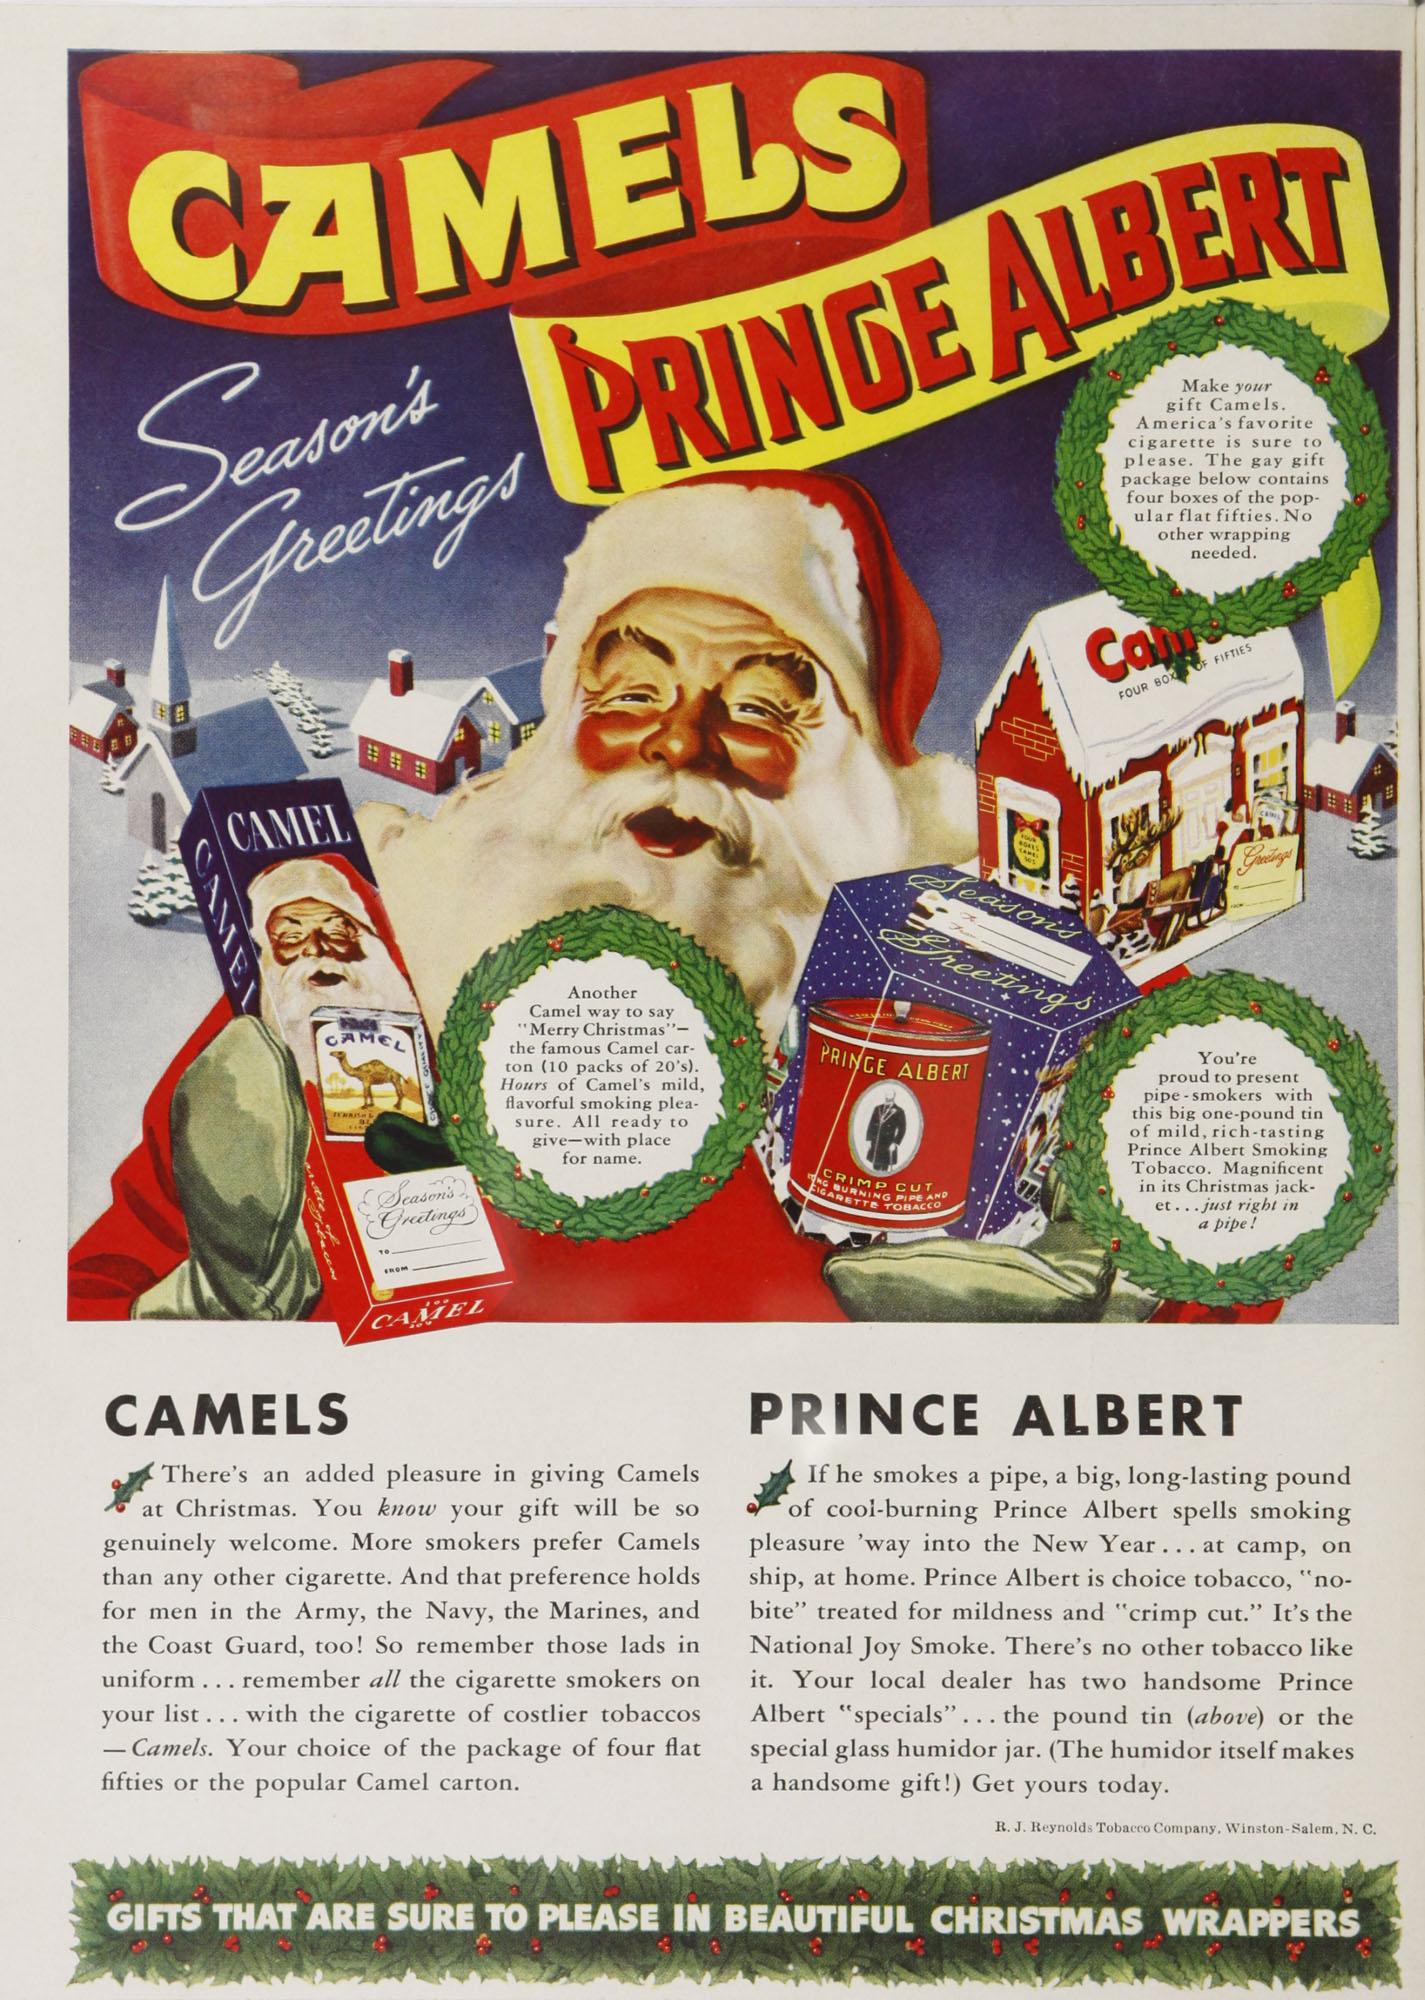 College of Charleston Magazine, 1941-1942, Vol. 45 No. 1, advertisement